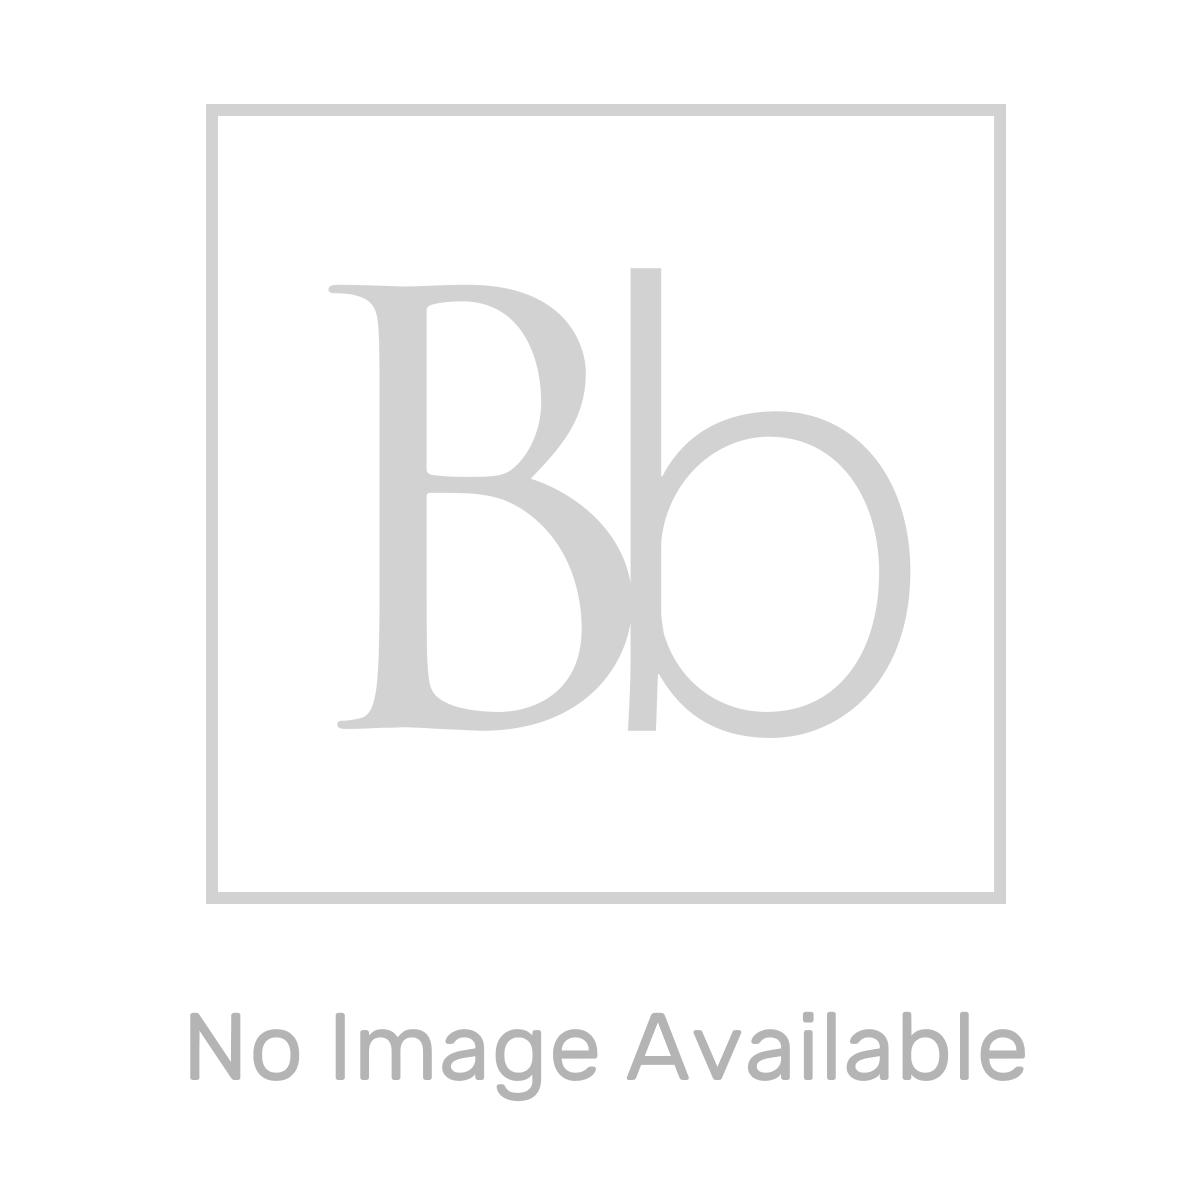 Frontline Compact Bath Taps